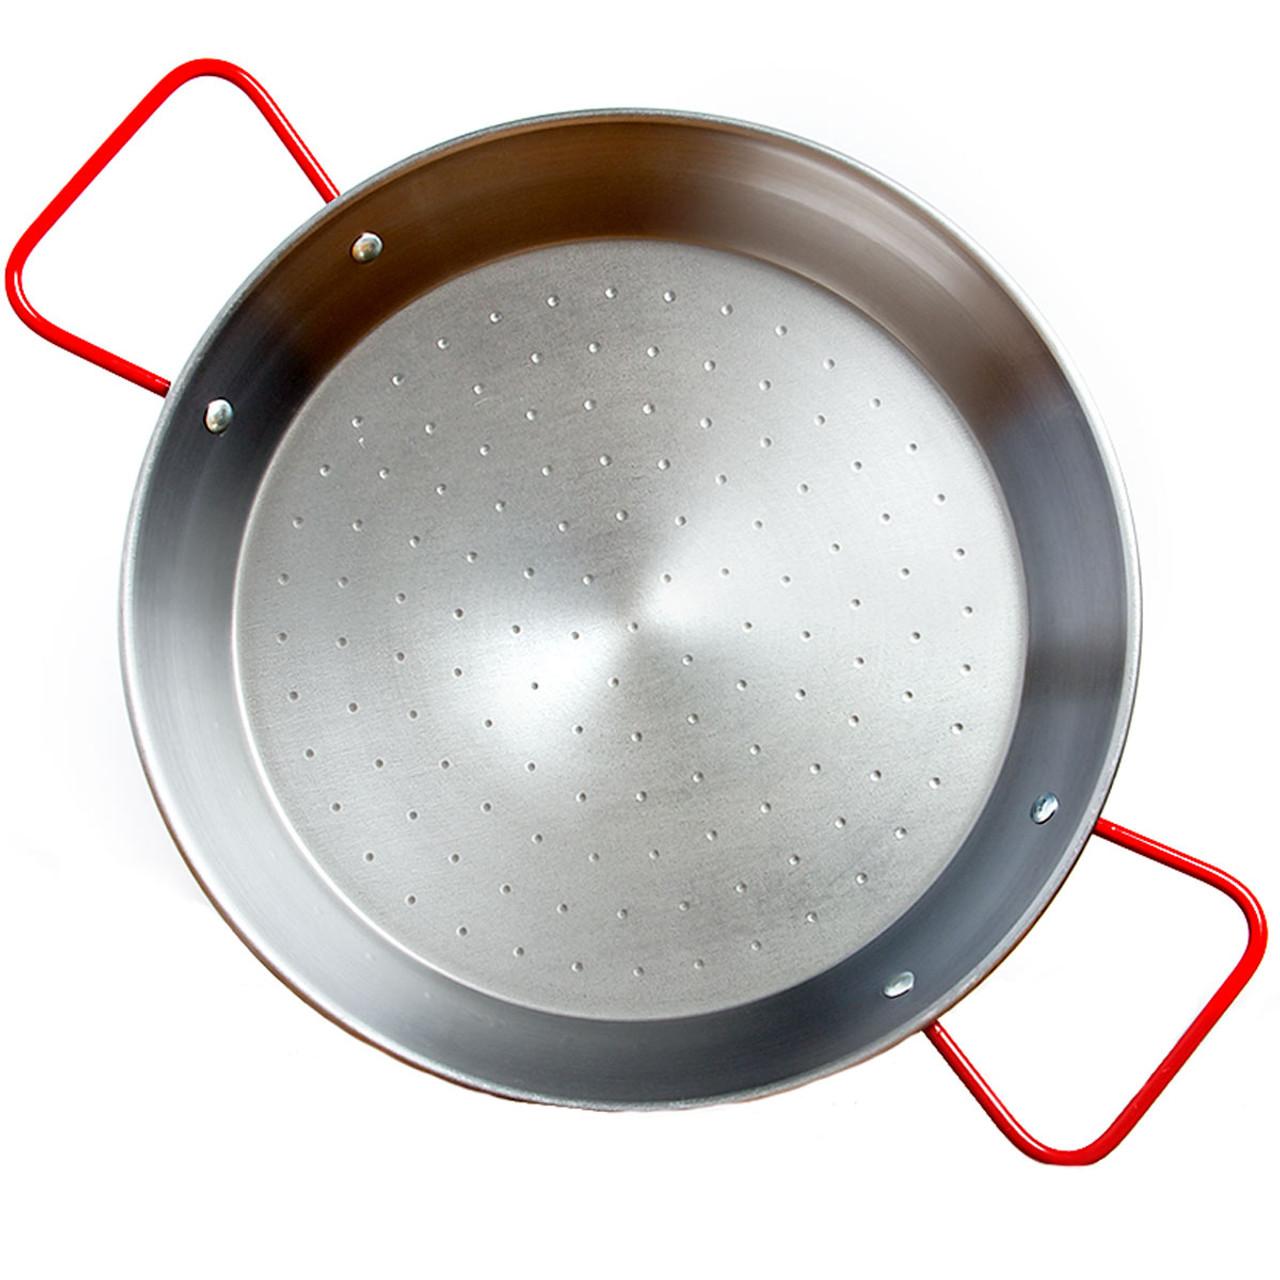 Polished Steel Valencian paella pan 14 Inch 34cm 6 Servings